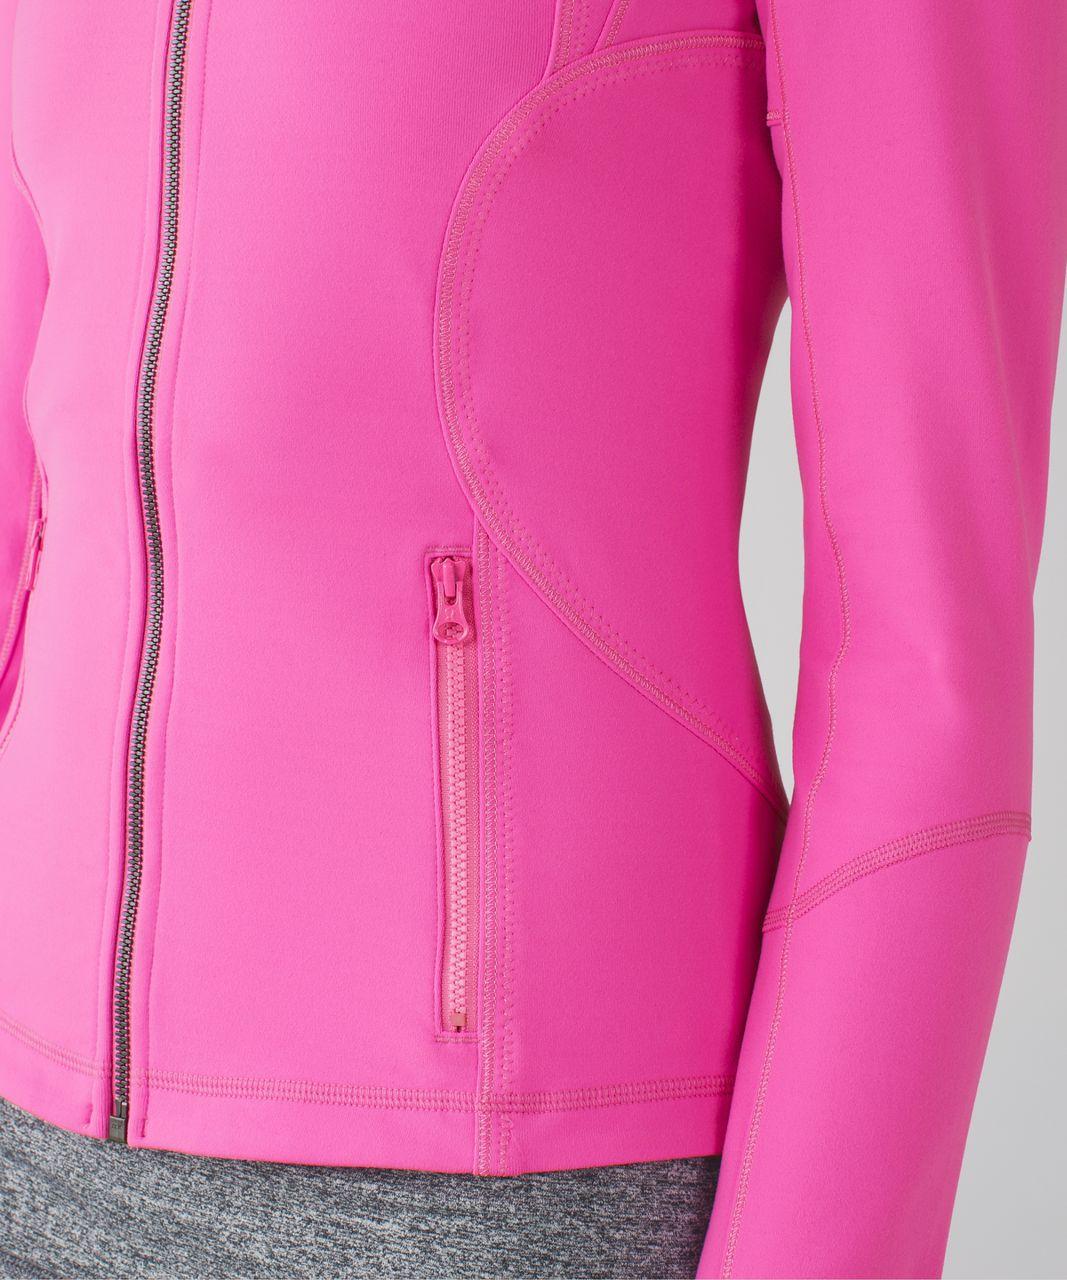 Lululemon Forme Jacket *Cuffins - Pow Pink Light